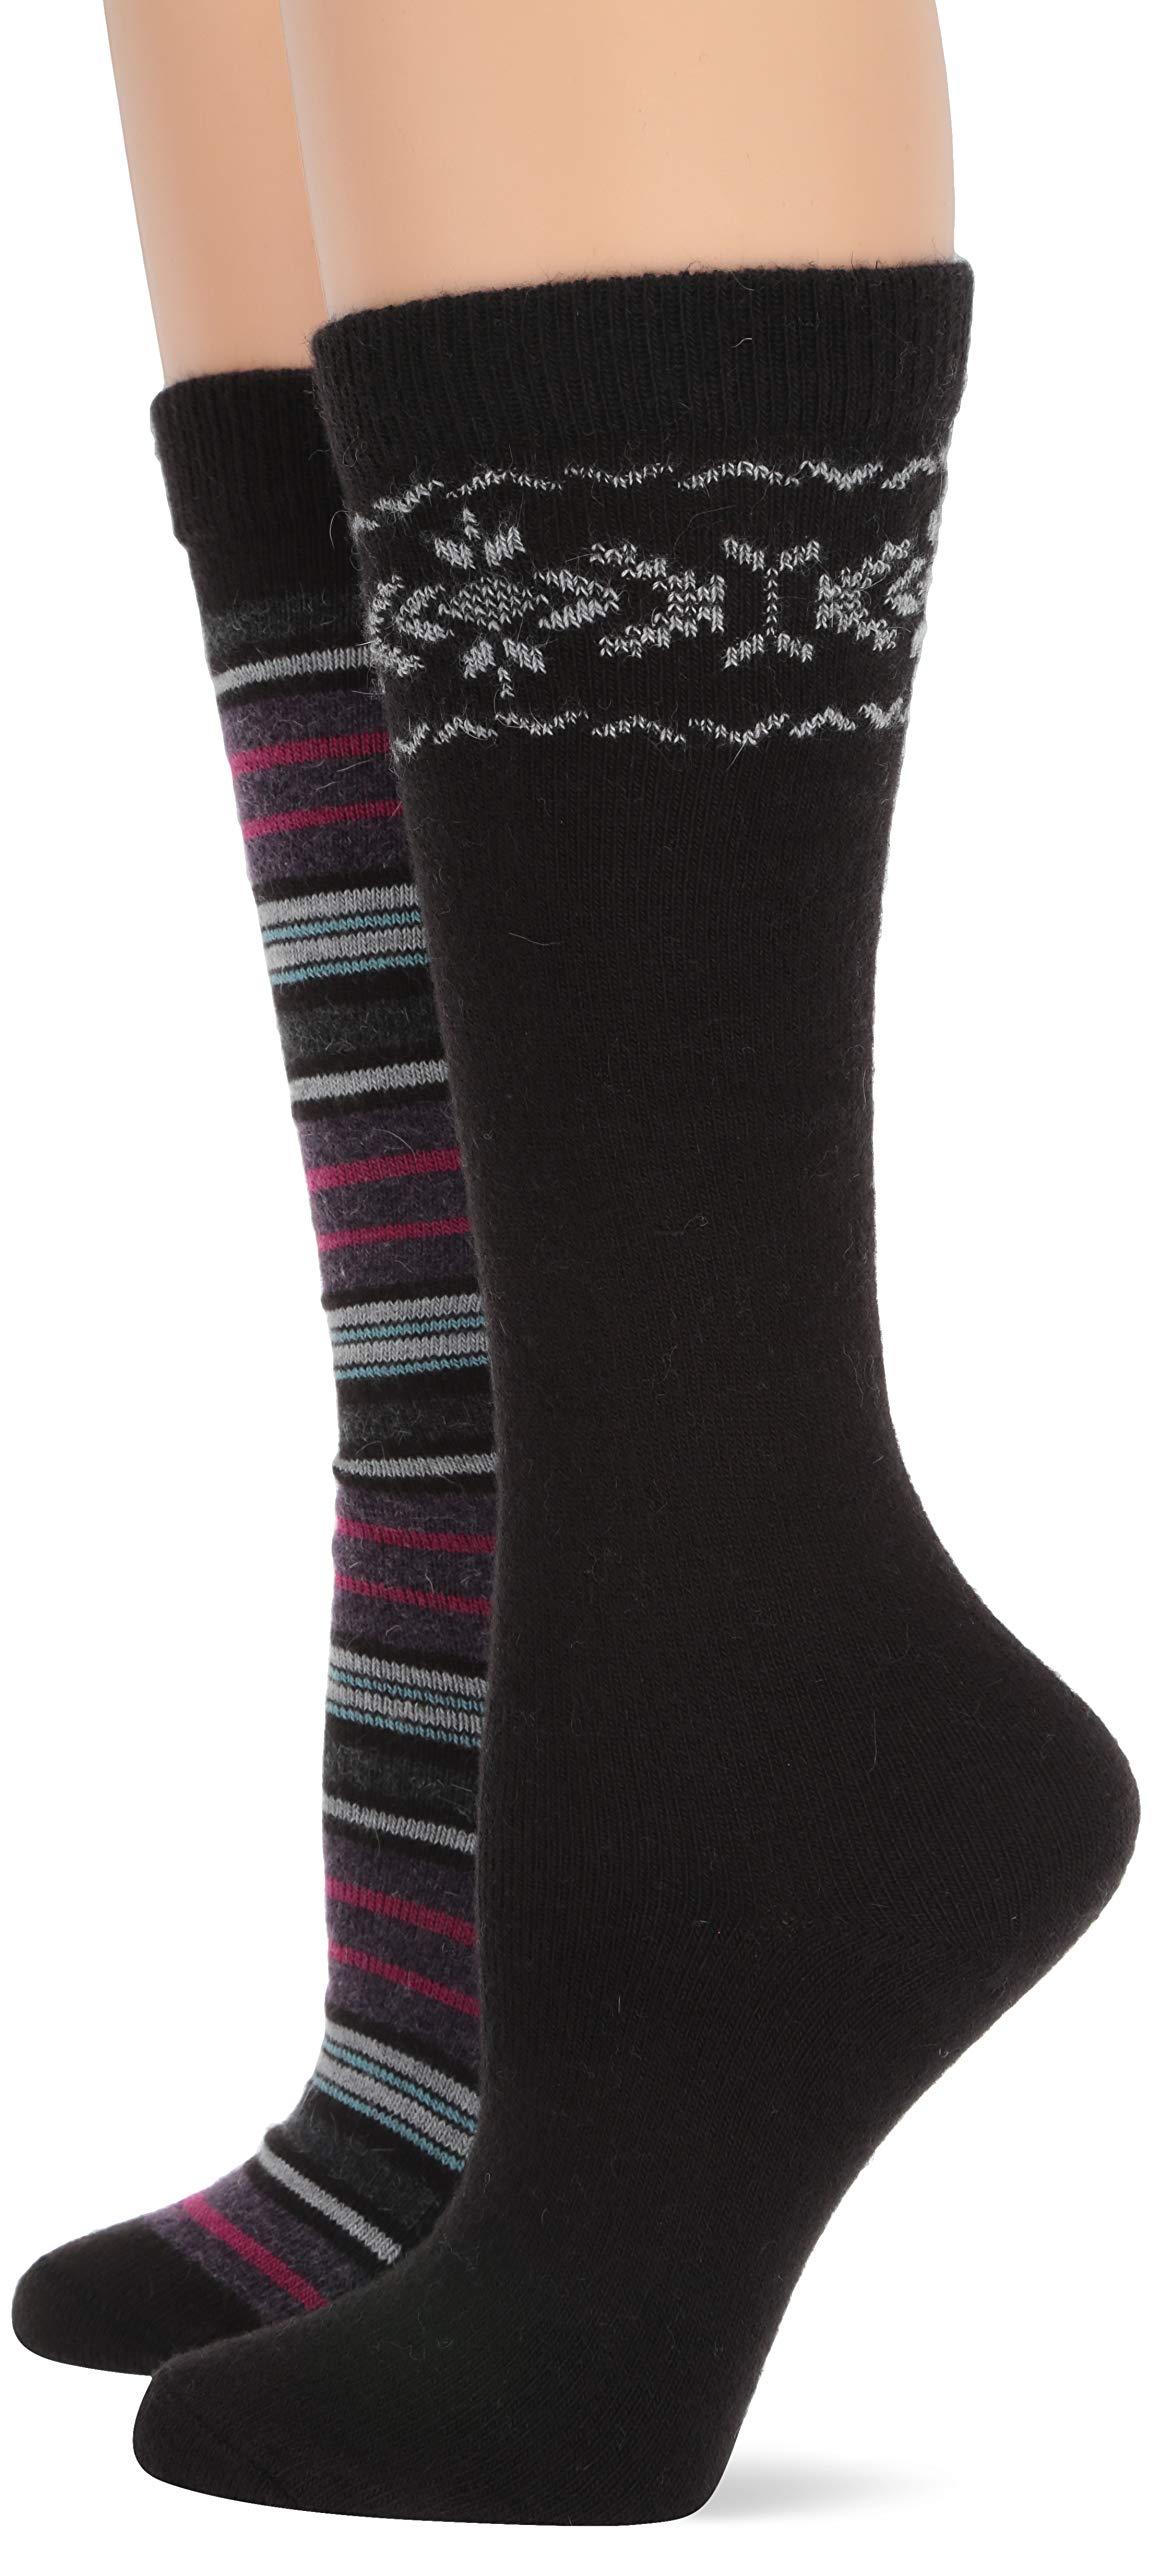 Wise Blend Women's Soft Angora Pattern Stripe Knee High Socks 2 Pair Pack